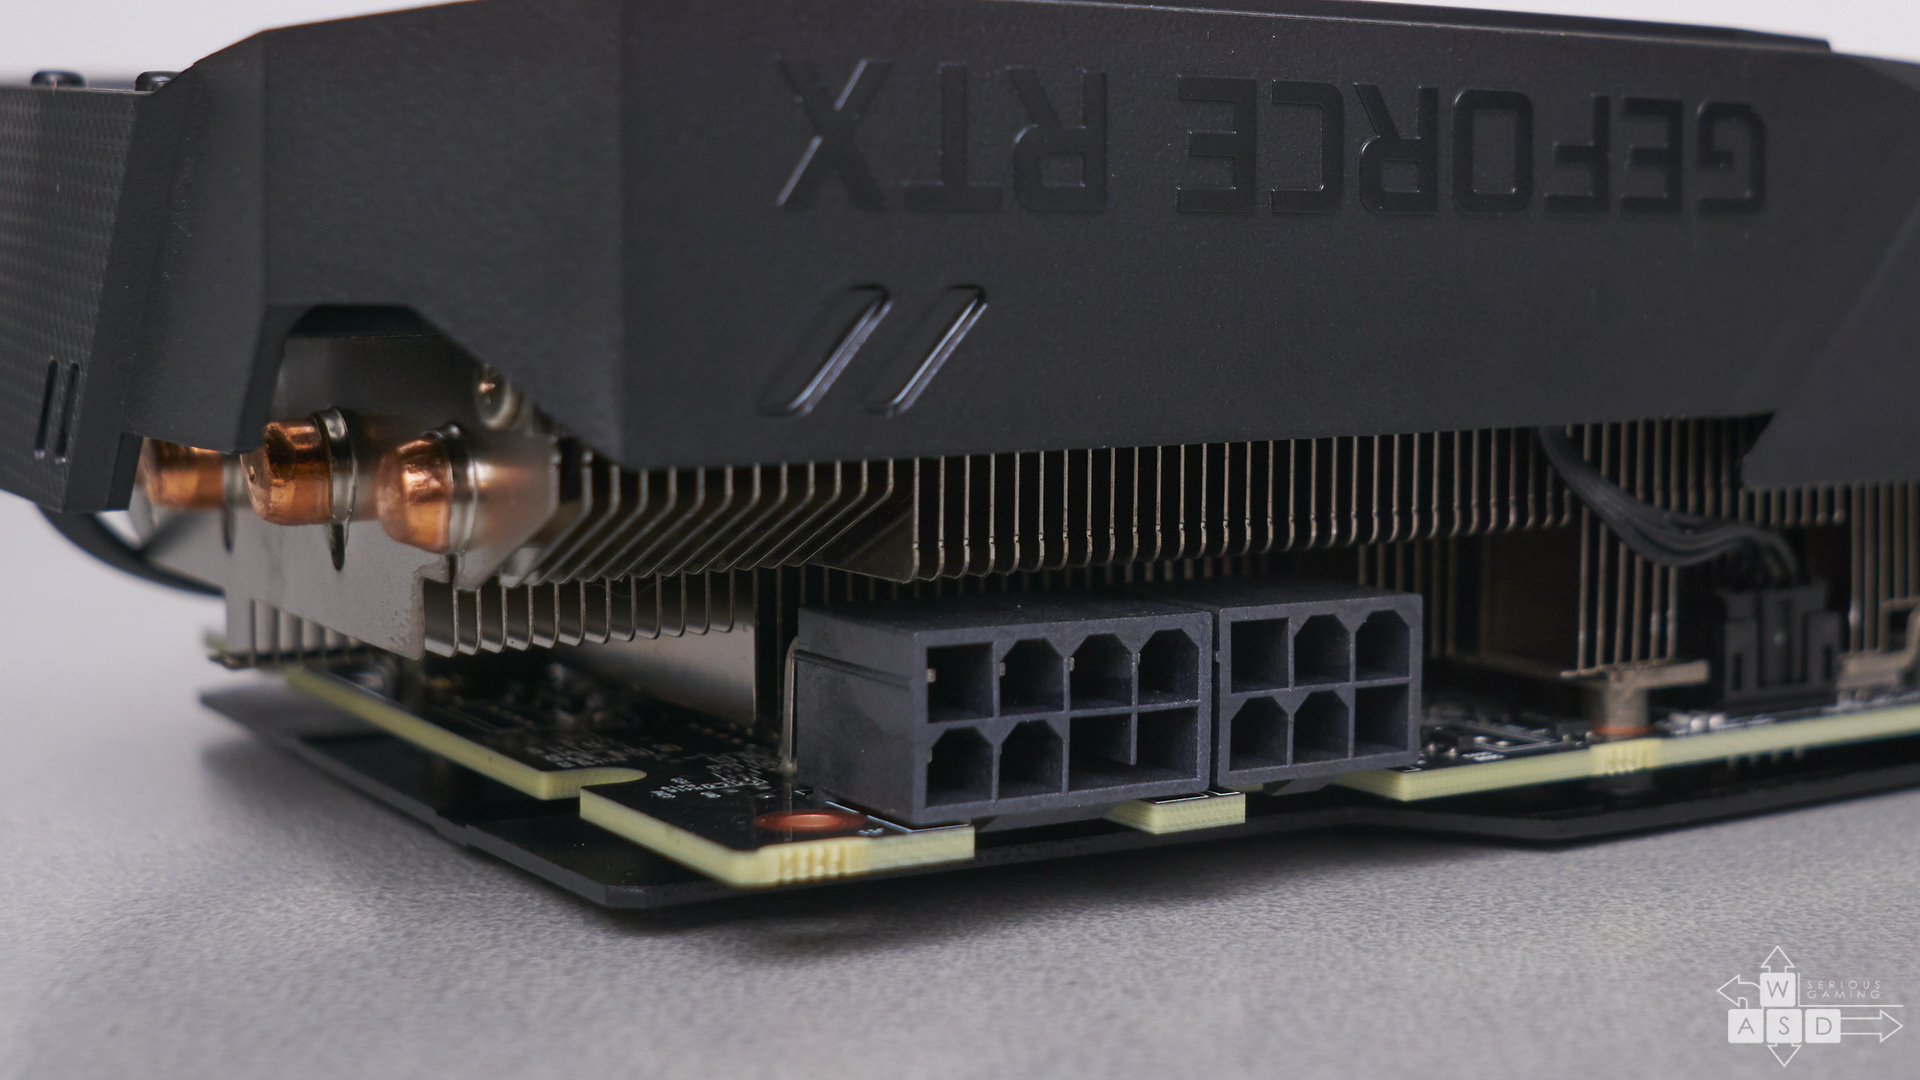 Gigabyte GeForce RTX 2070 Super Gaming OC 8G review   WASD